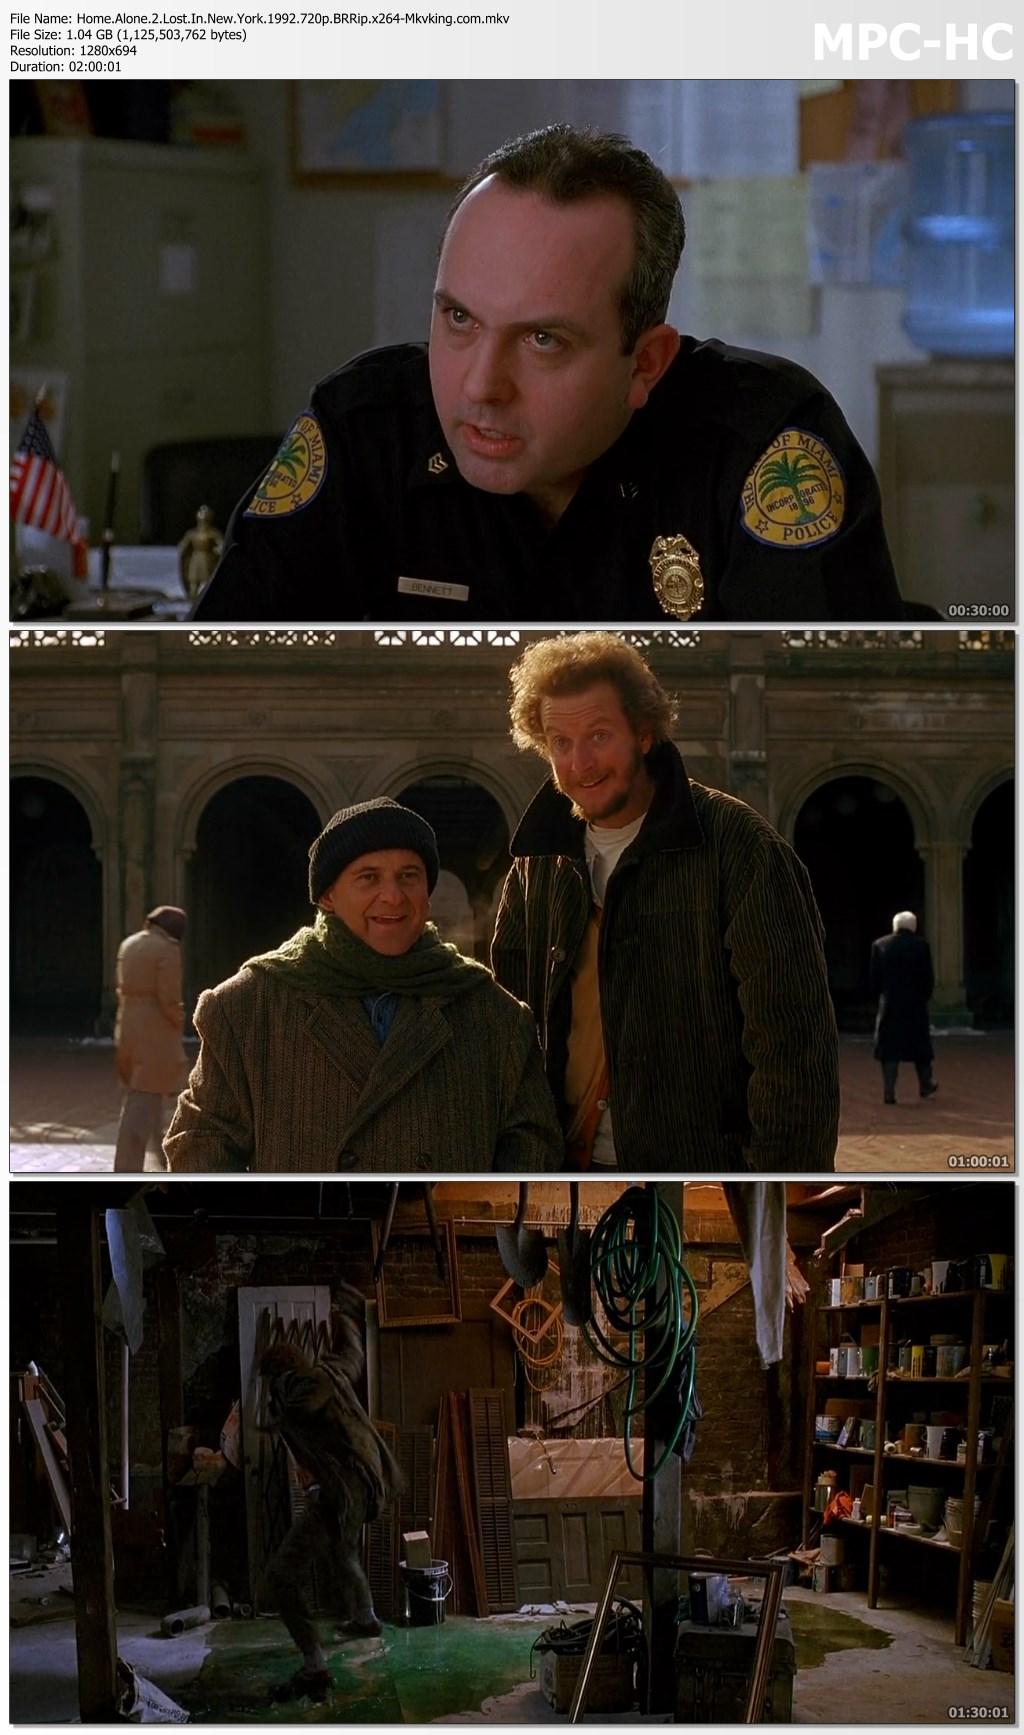 Home Alone 2 Lost In New York 1992 720p Brrip X264 Mkvking Com Mkv Thumbs Imgbb